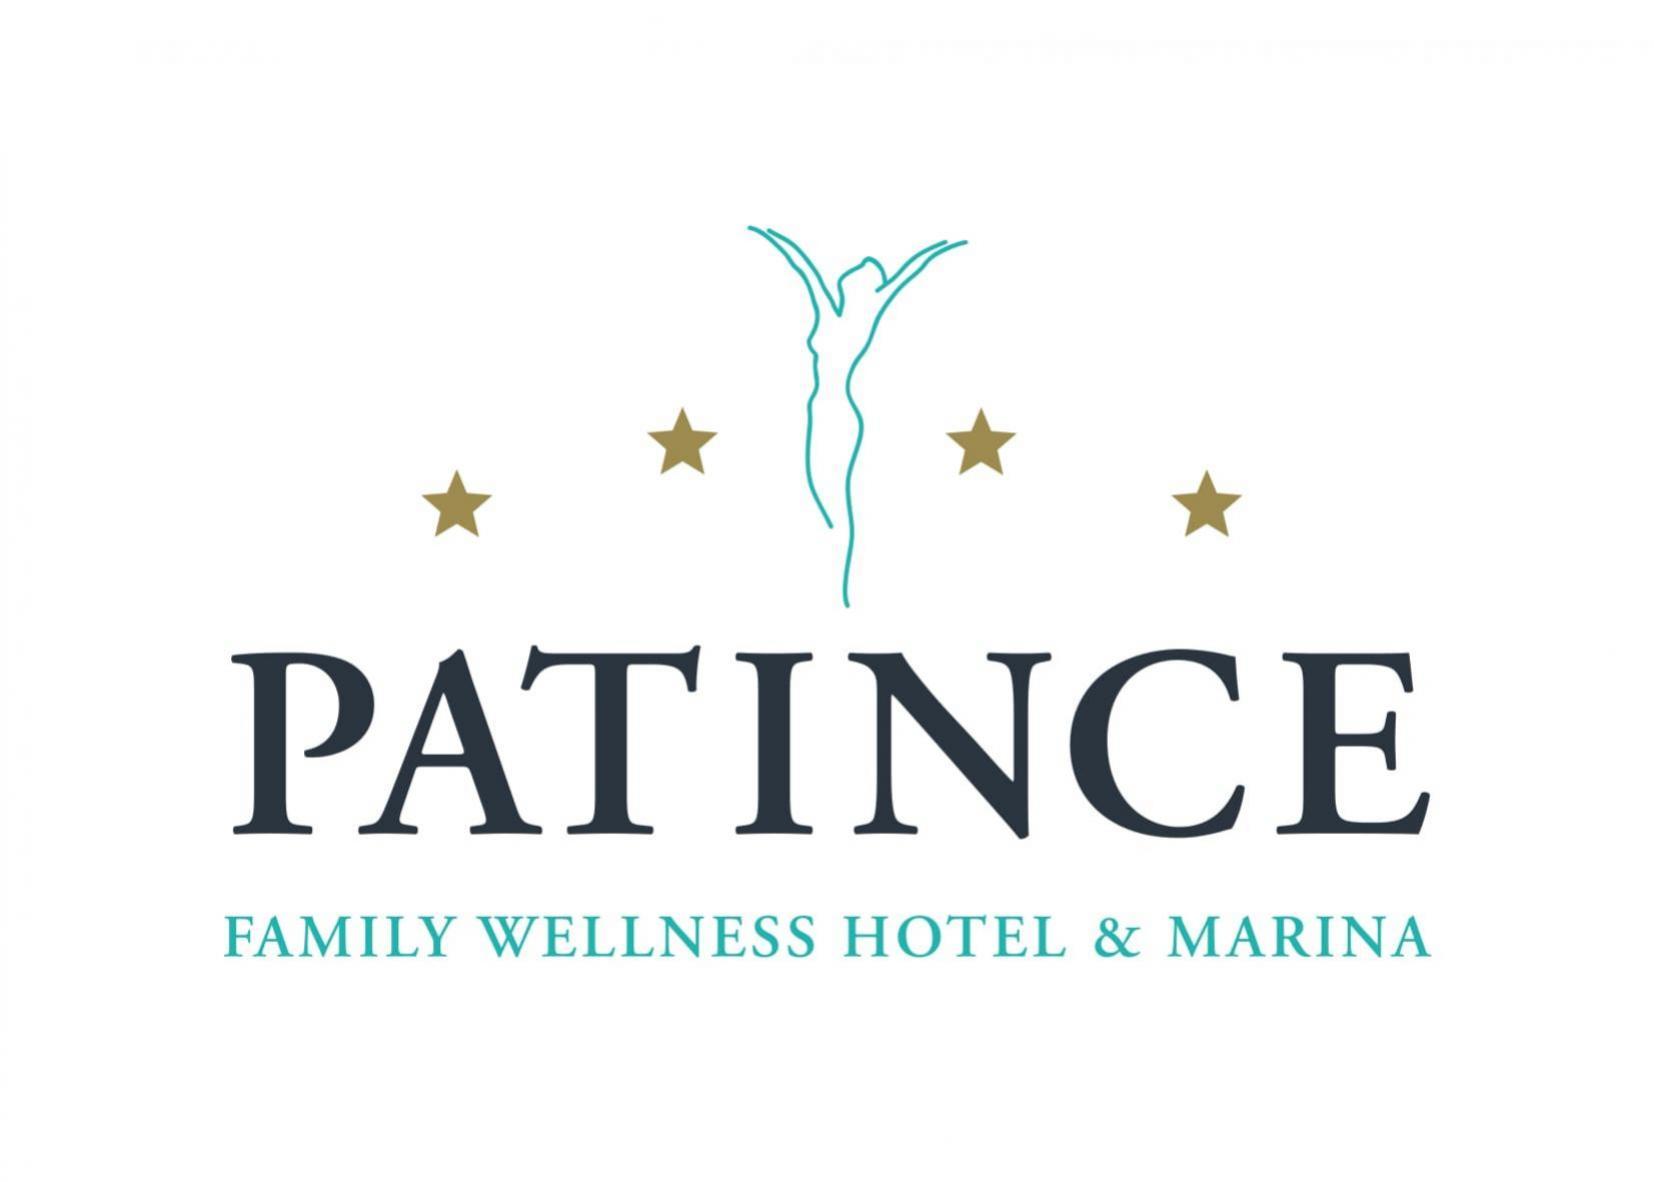 Patince